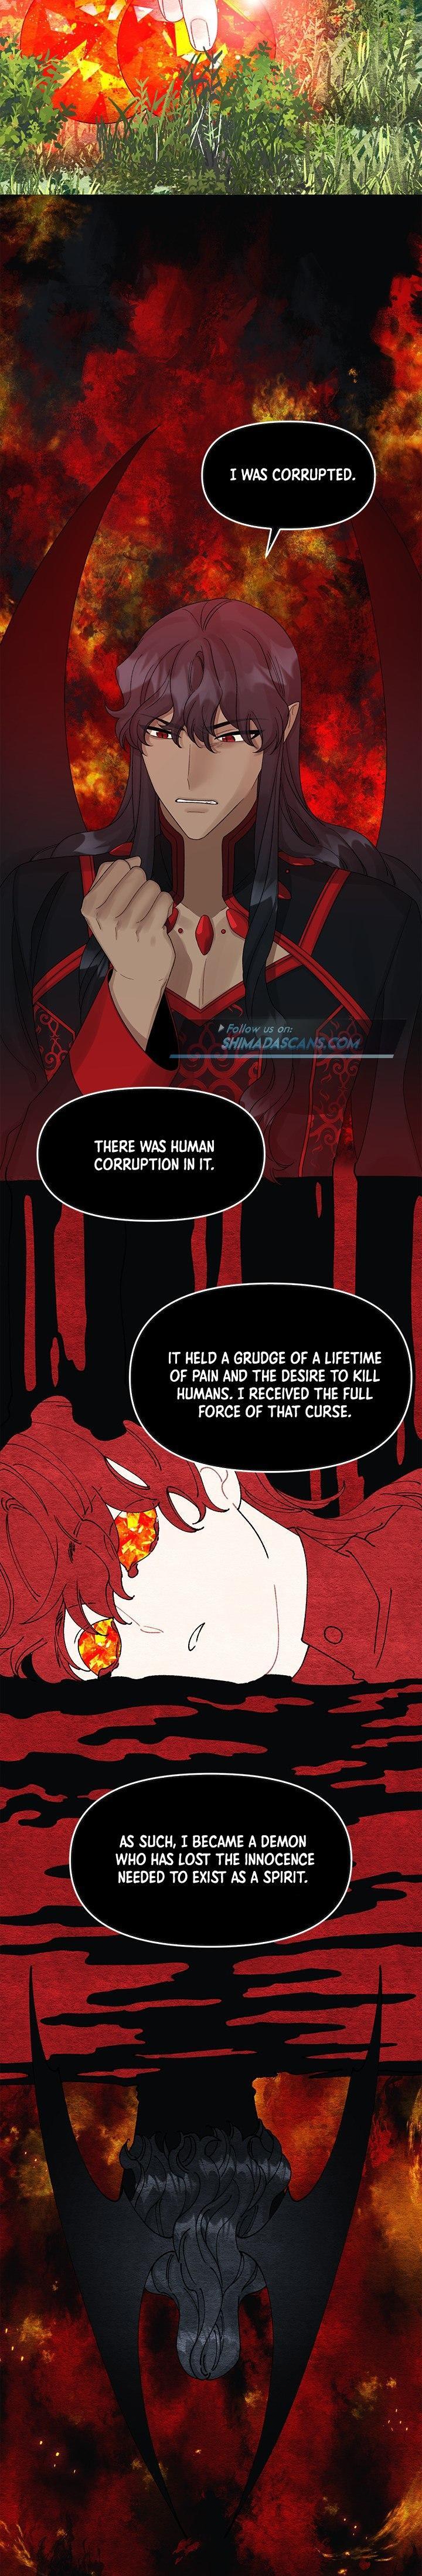 The Princess In The Dumpster Chapter 45 page 13 - Mangakakalots.com